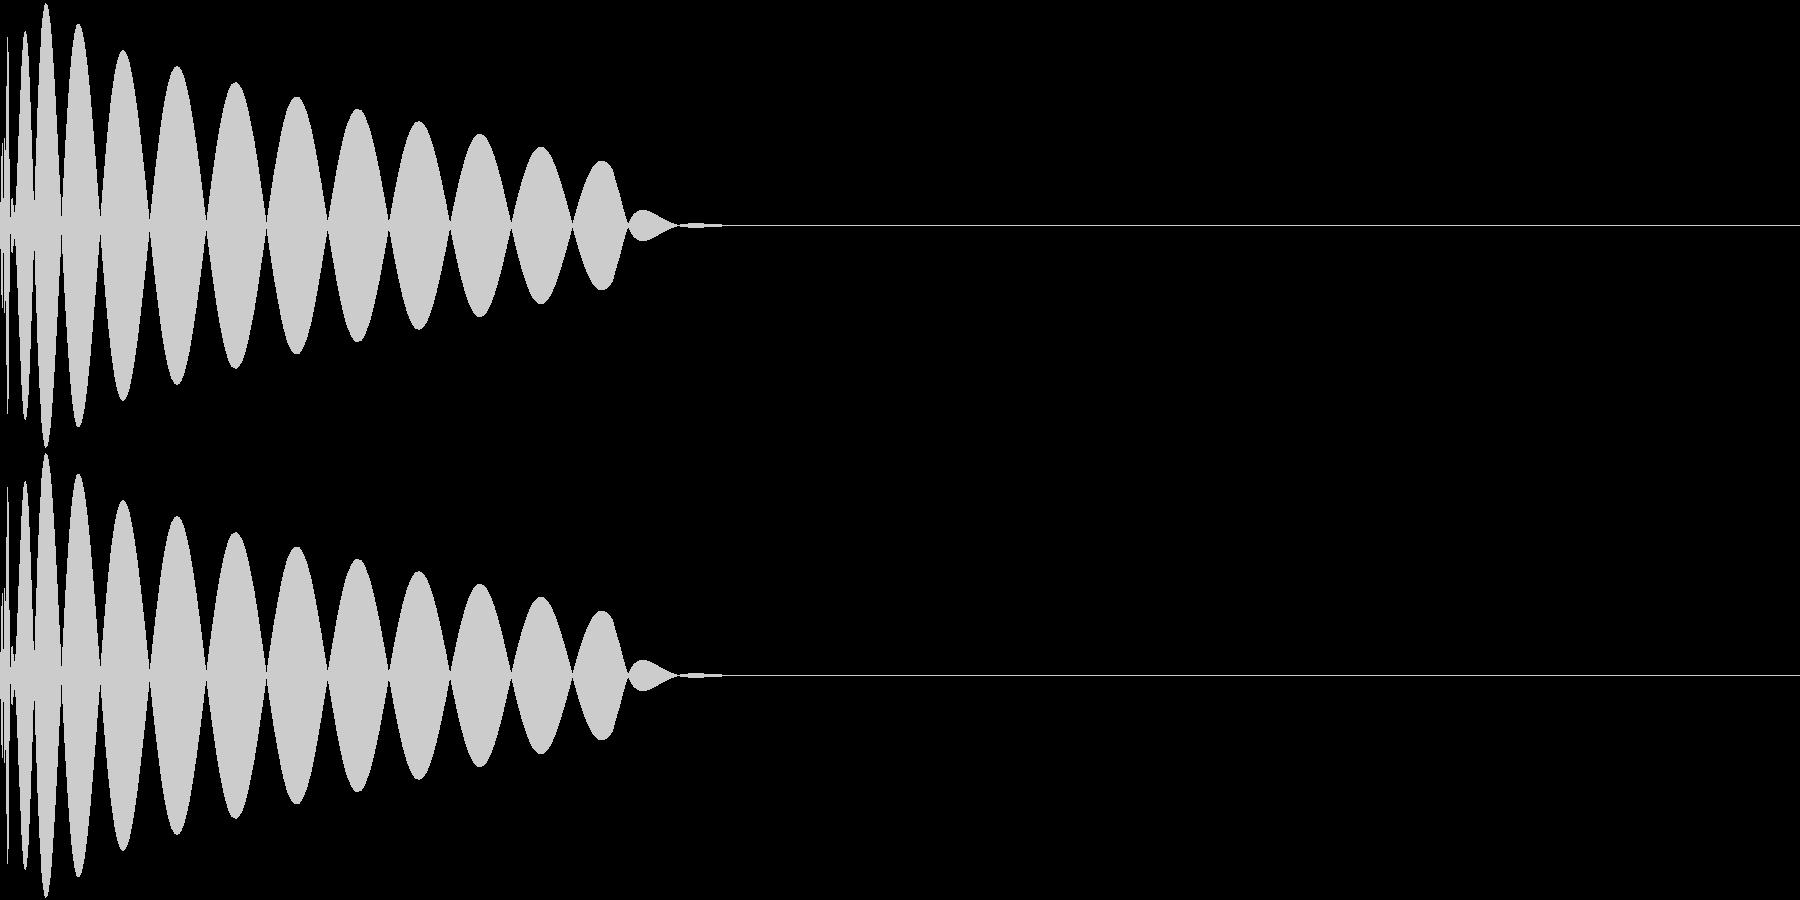 DTM Kick 37 オリジナル音源の未再生の波形